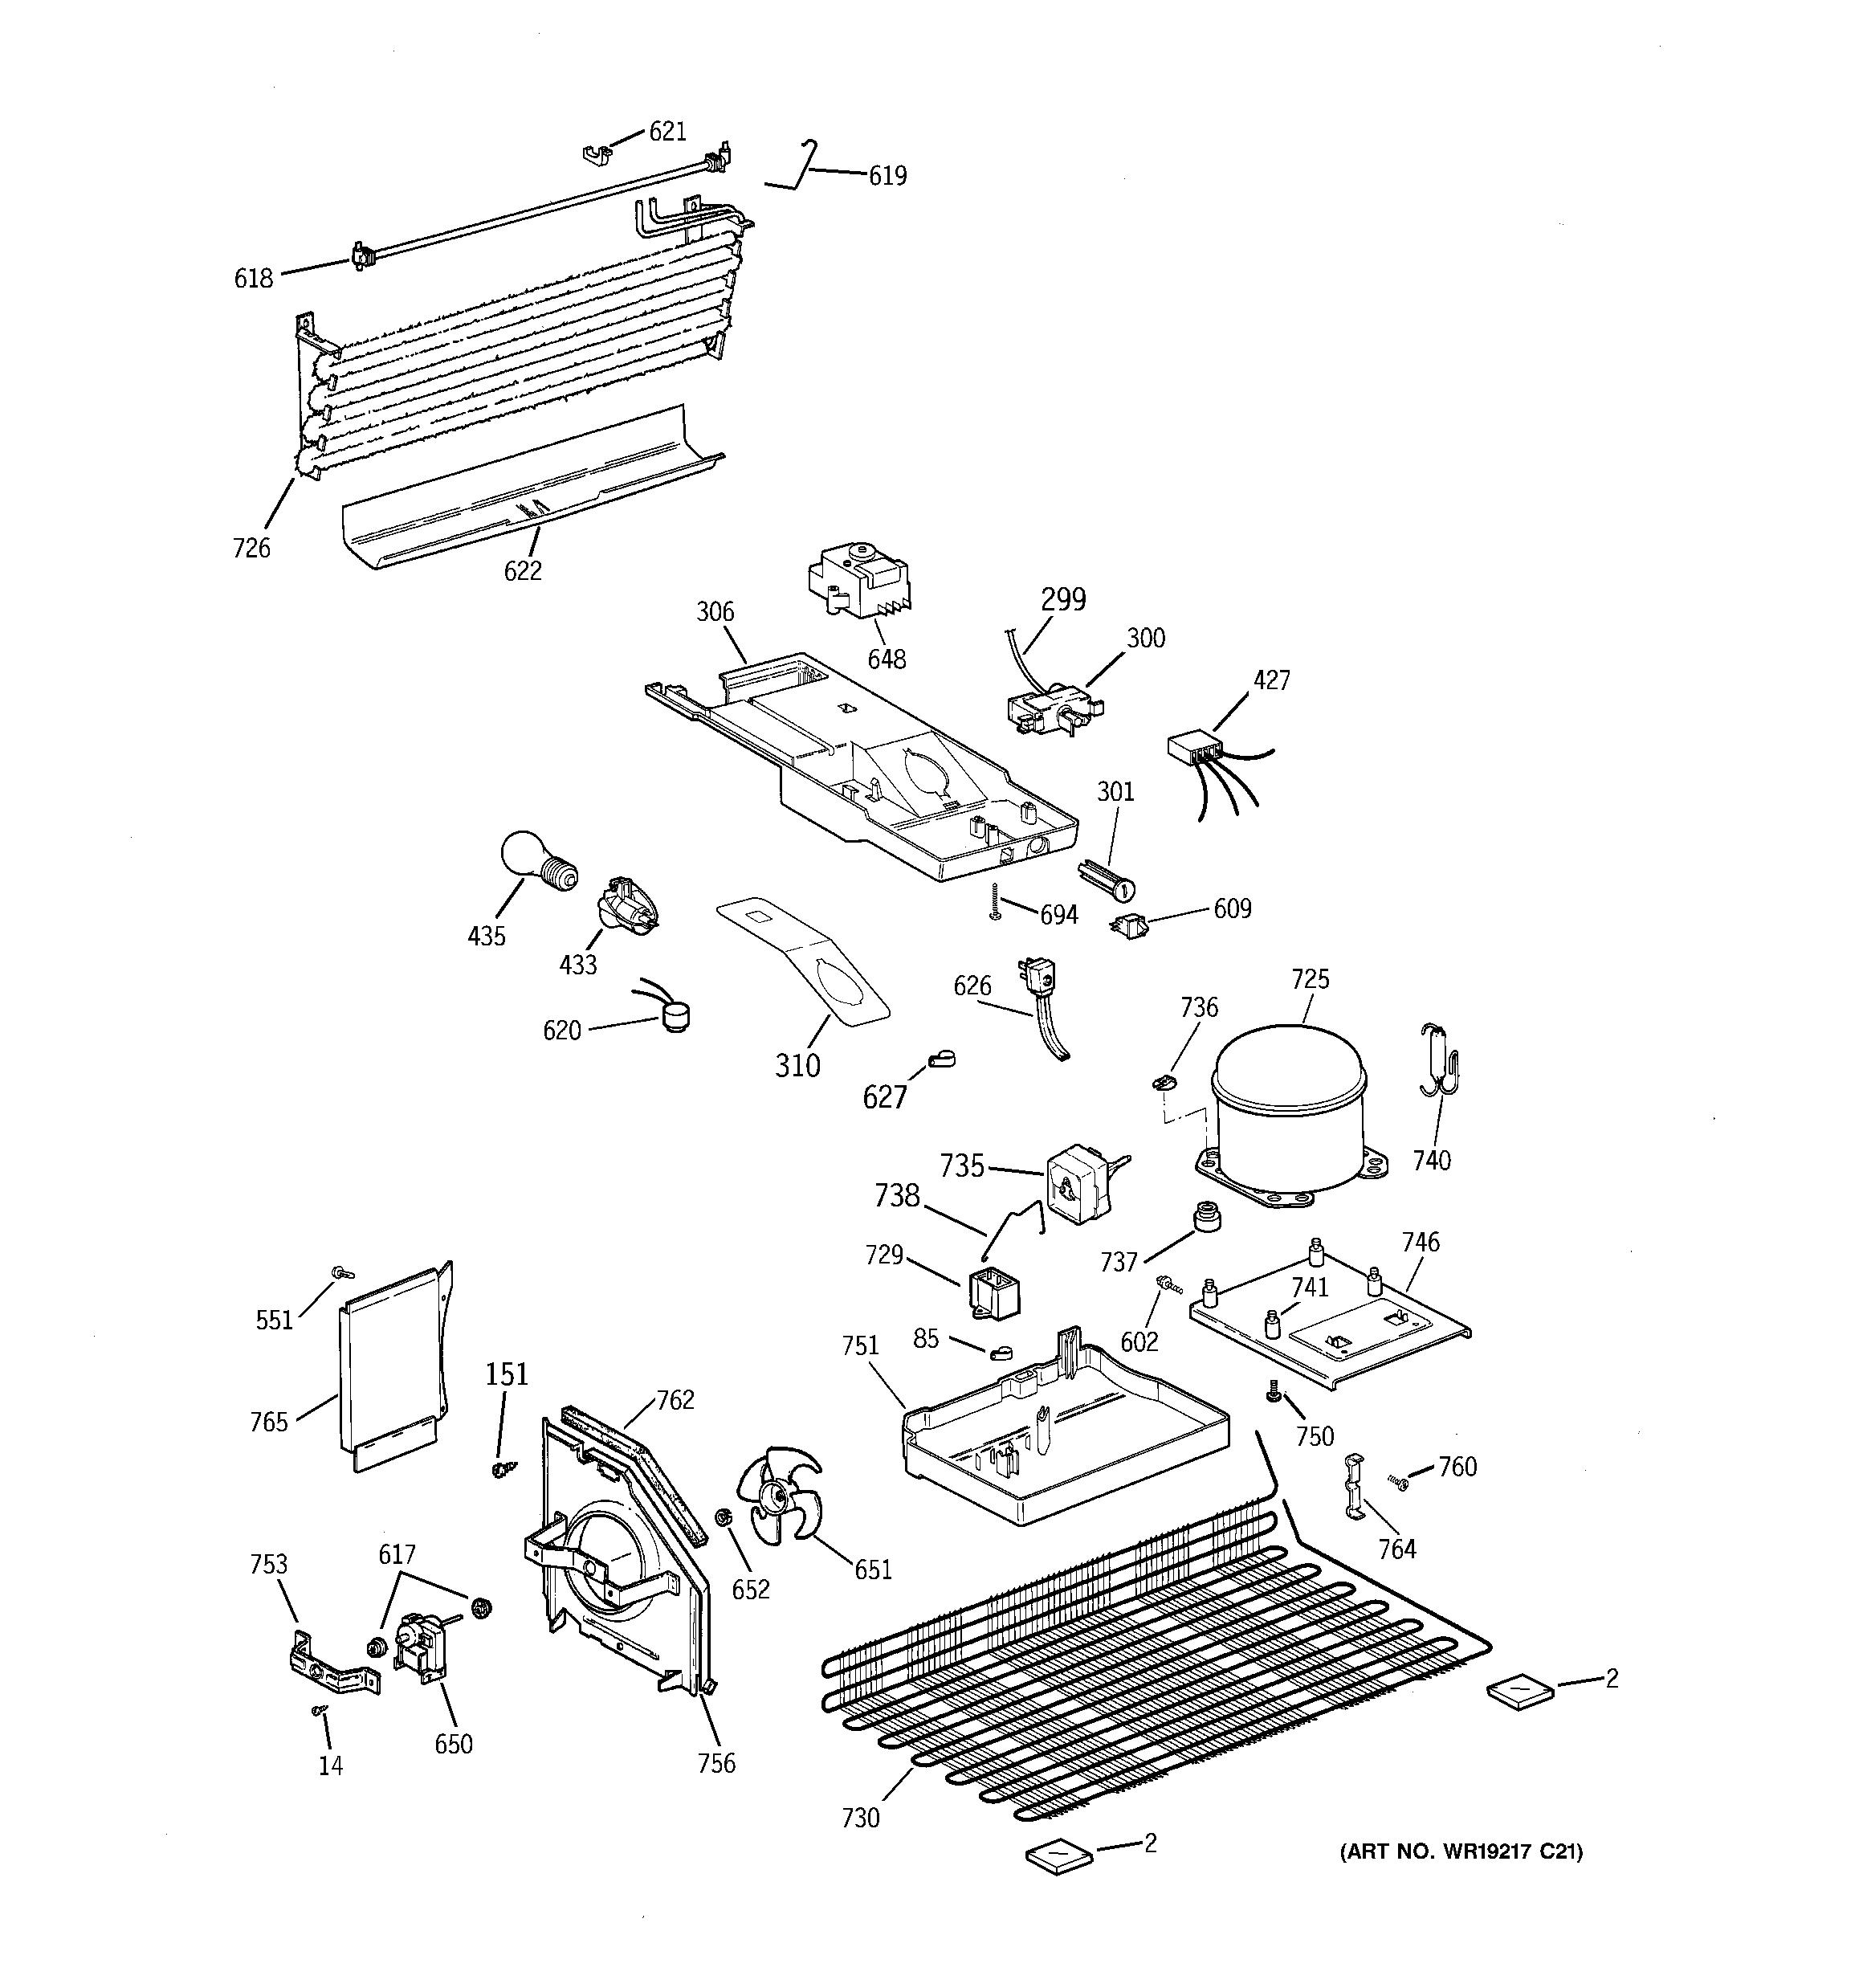 90E27C Mey Ferguson 135 Starter Wiring Diagram | Wiring LibraryWiring Library